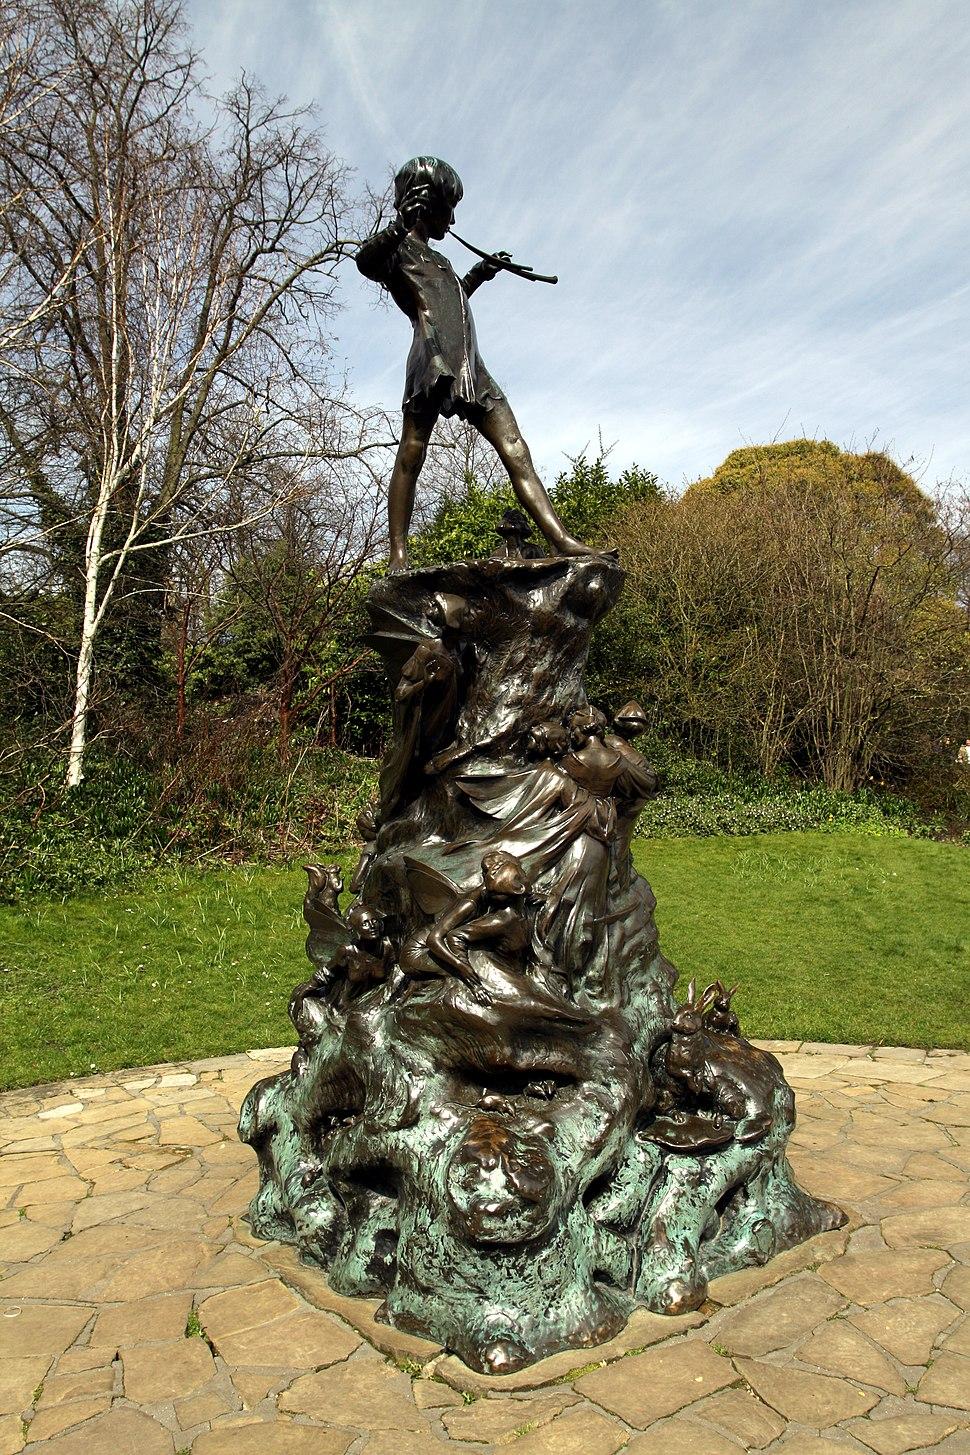 Peter Pan statue in Kensington Gardens in the City of Westminster in London, spring 2013 (12)